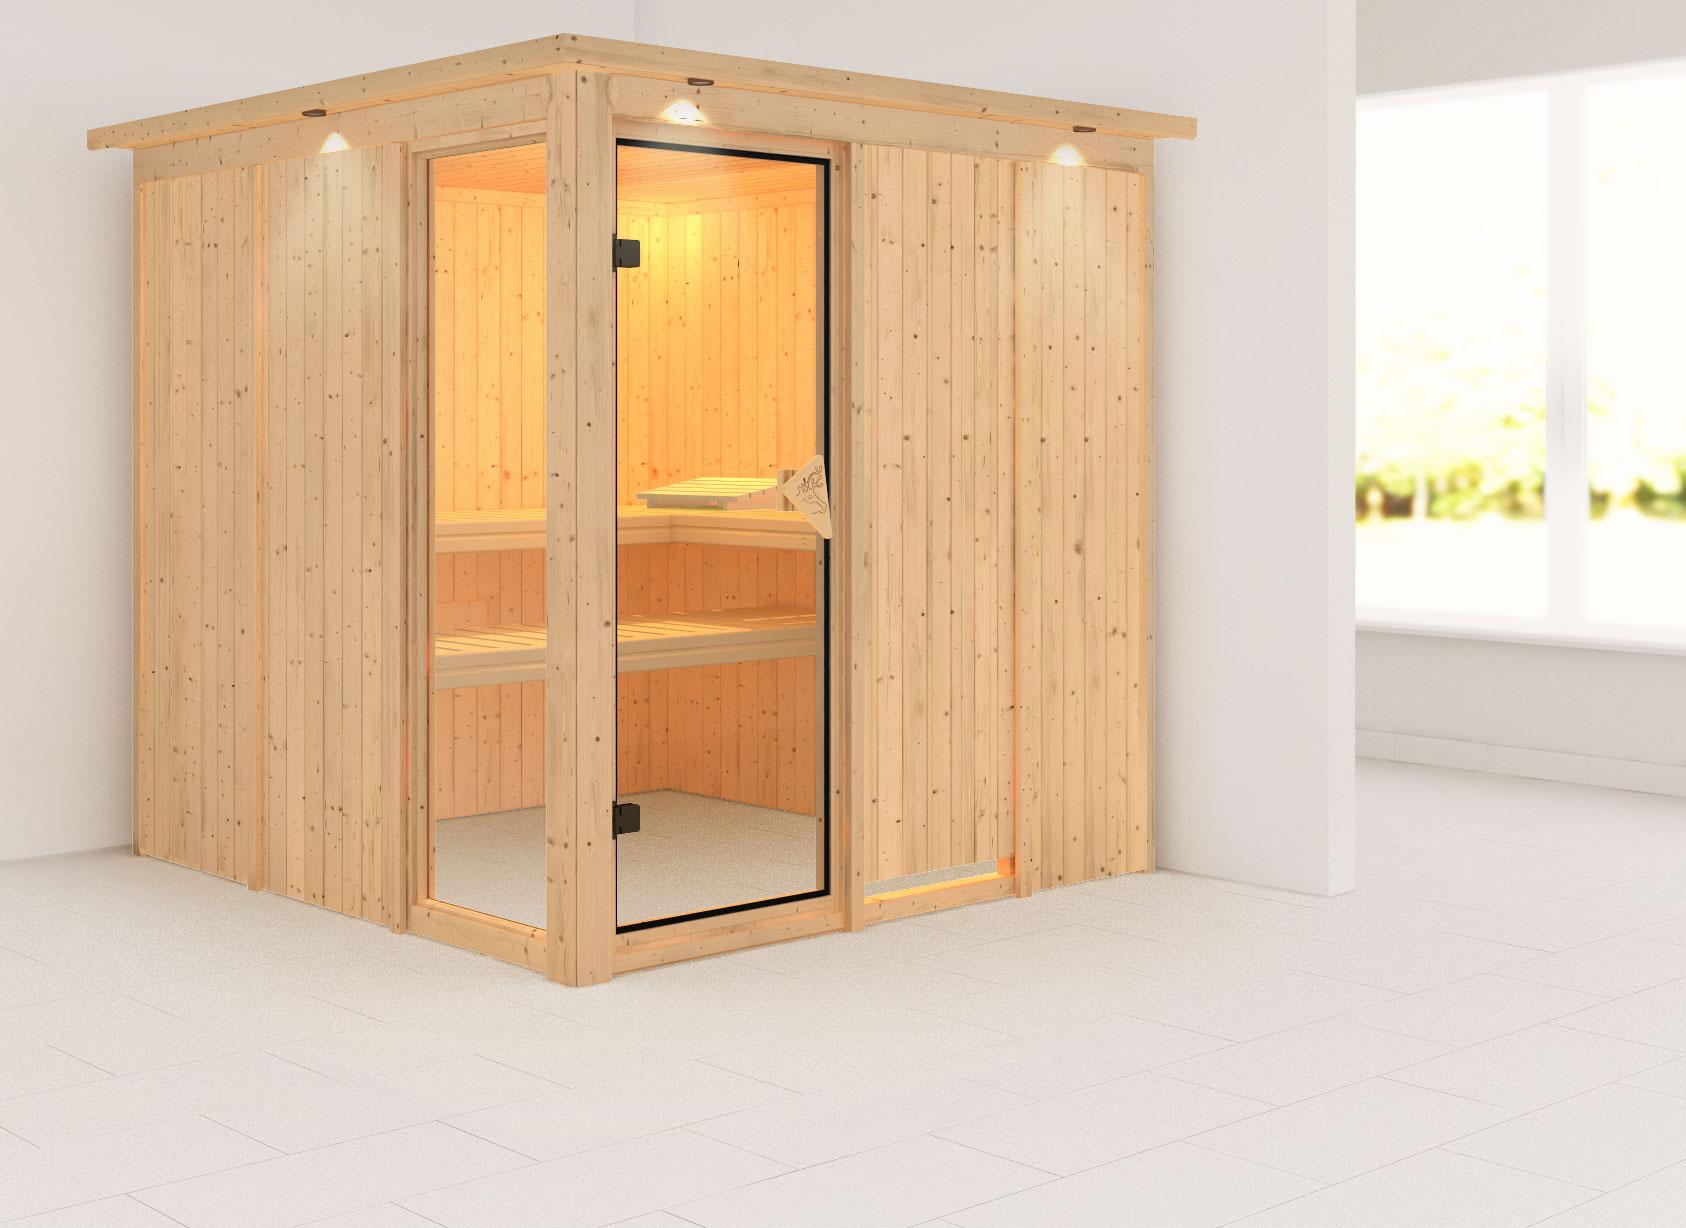 karibu sauna helin 68mm dachkranz ohne ofen classic t r. Black Bedroom Furniture Sets. Home Design Ideas